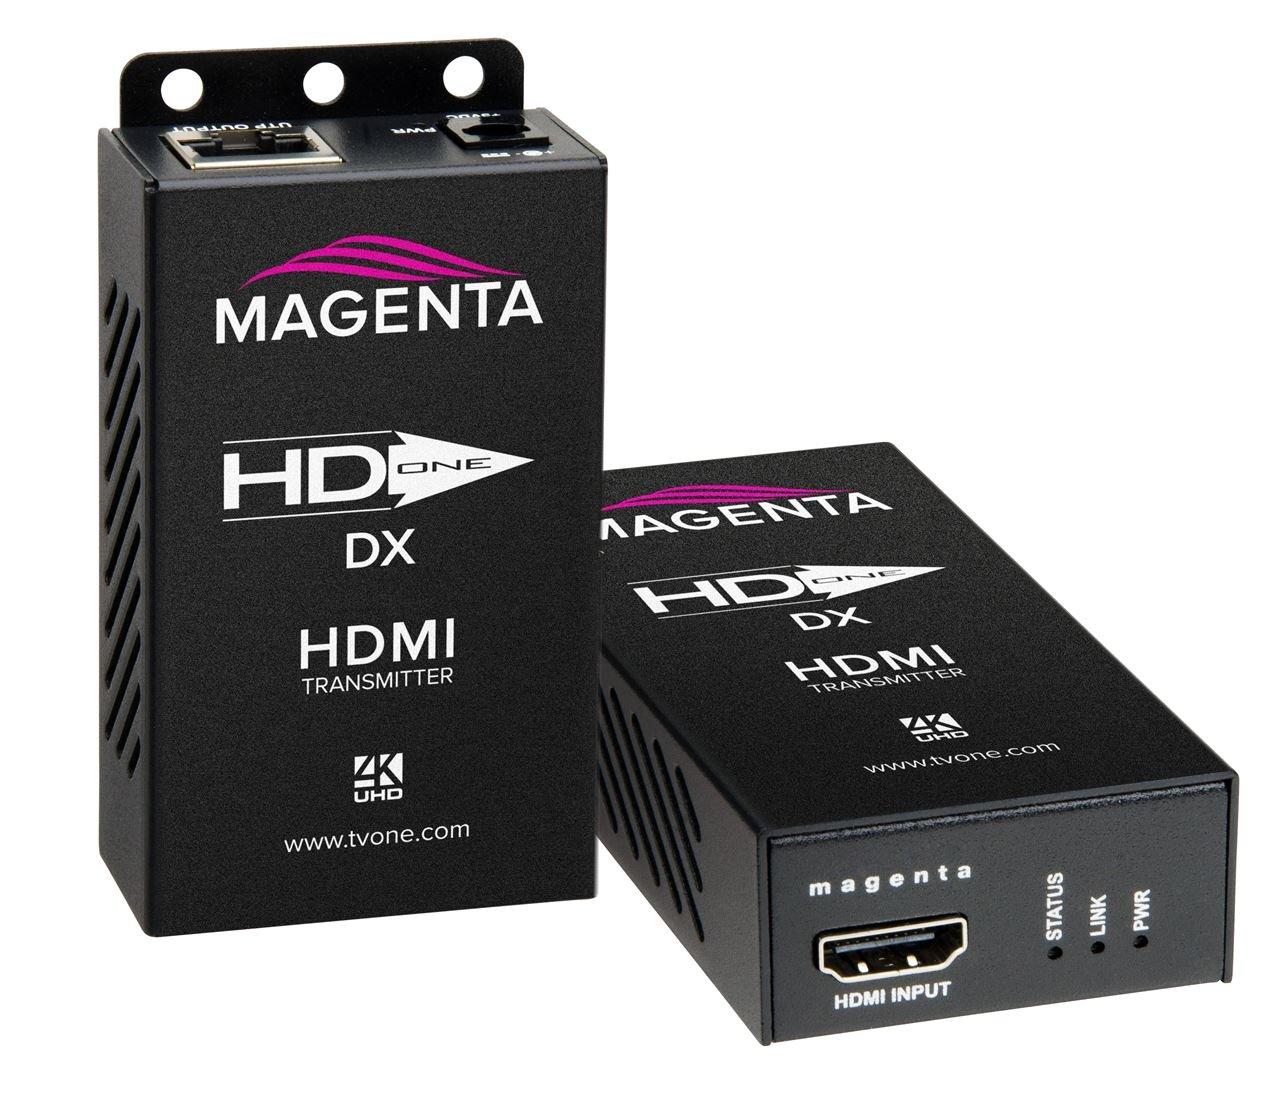 HD-One DX-1